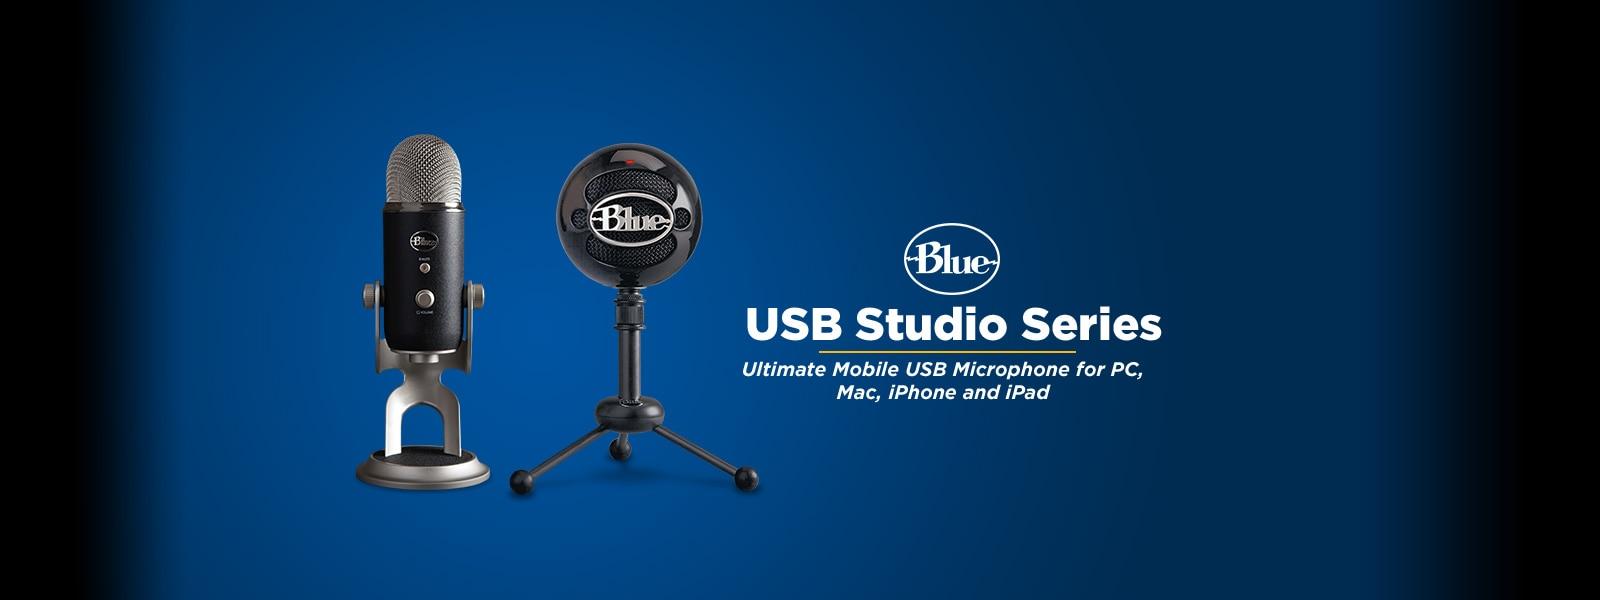 BLUEUSB Studio Series